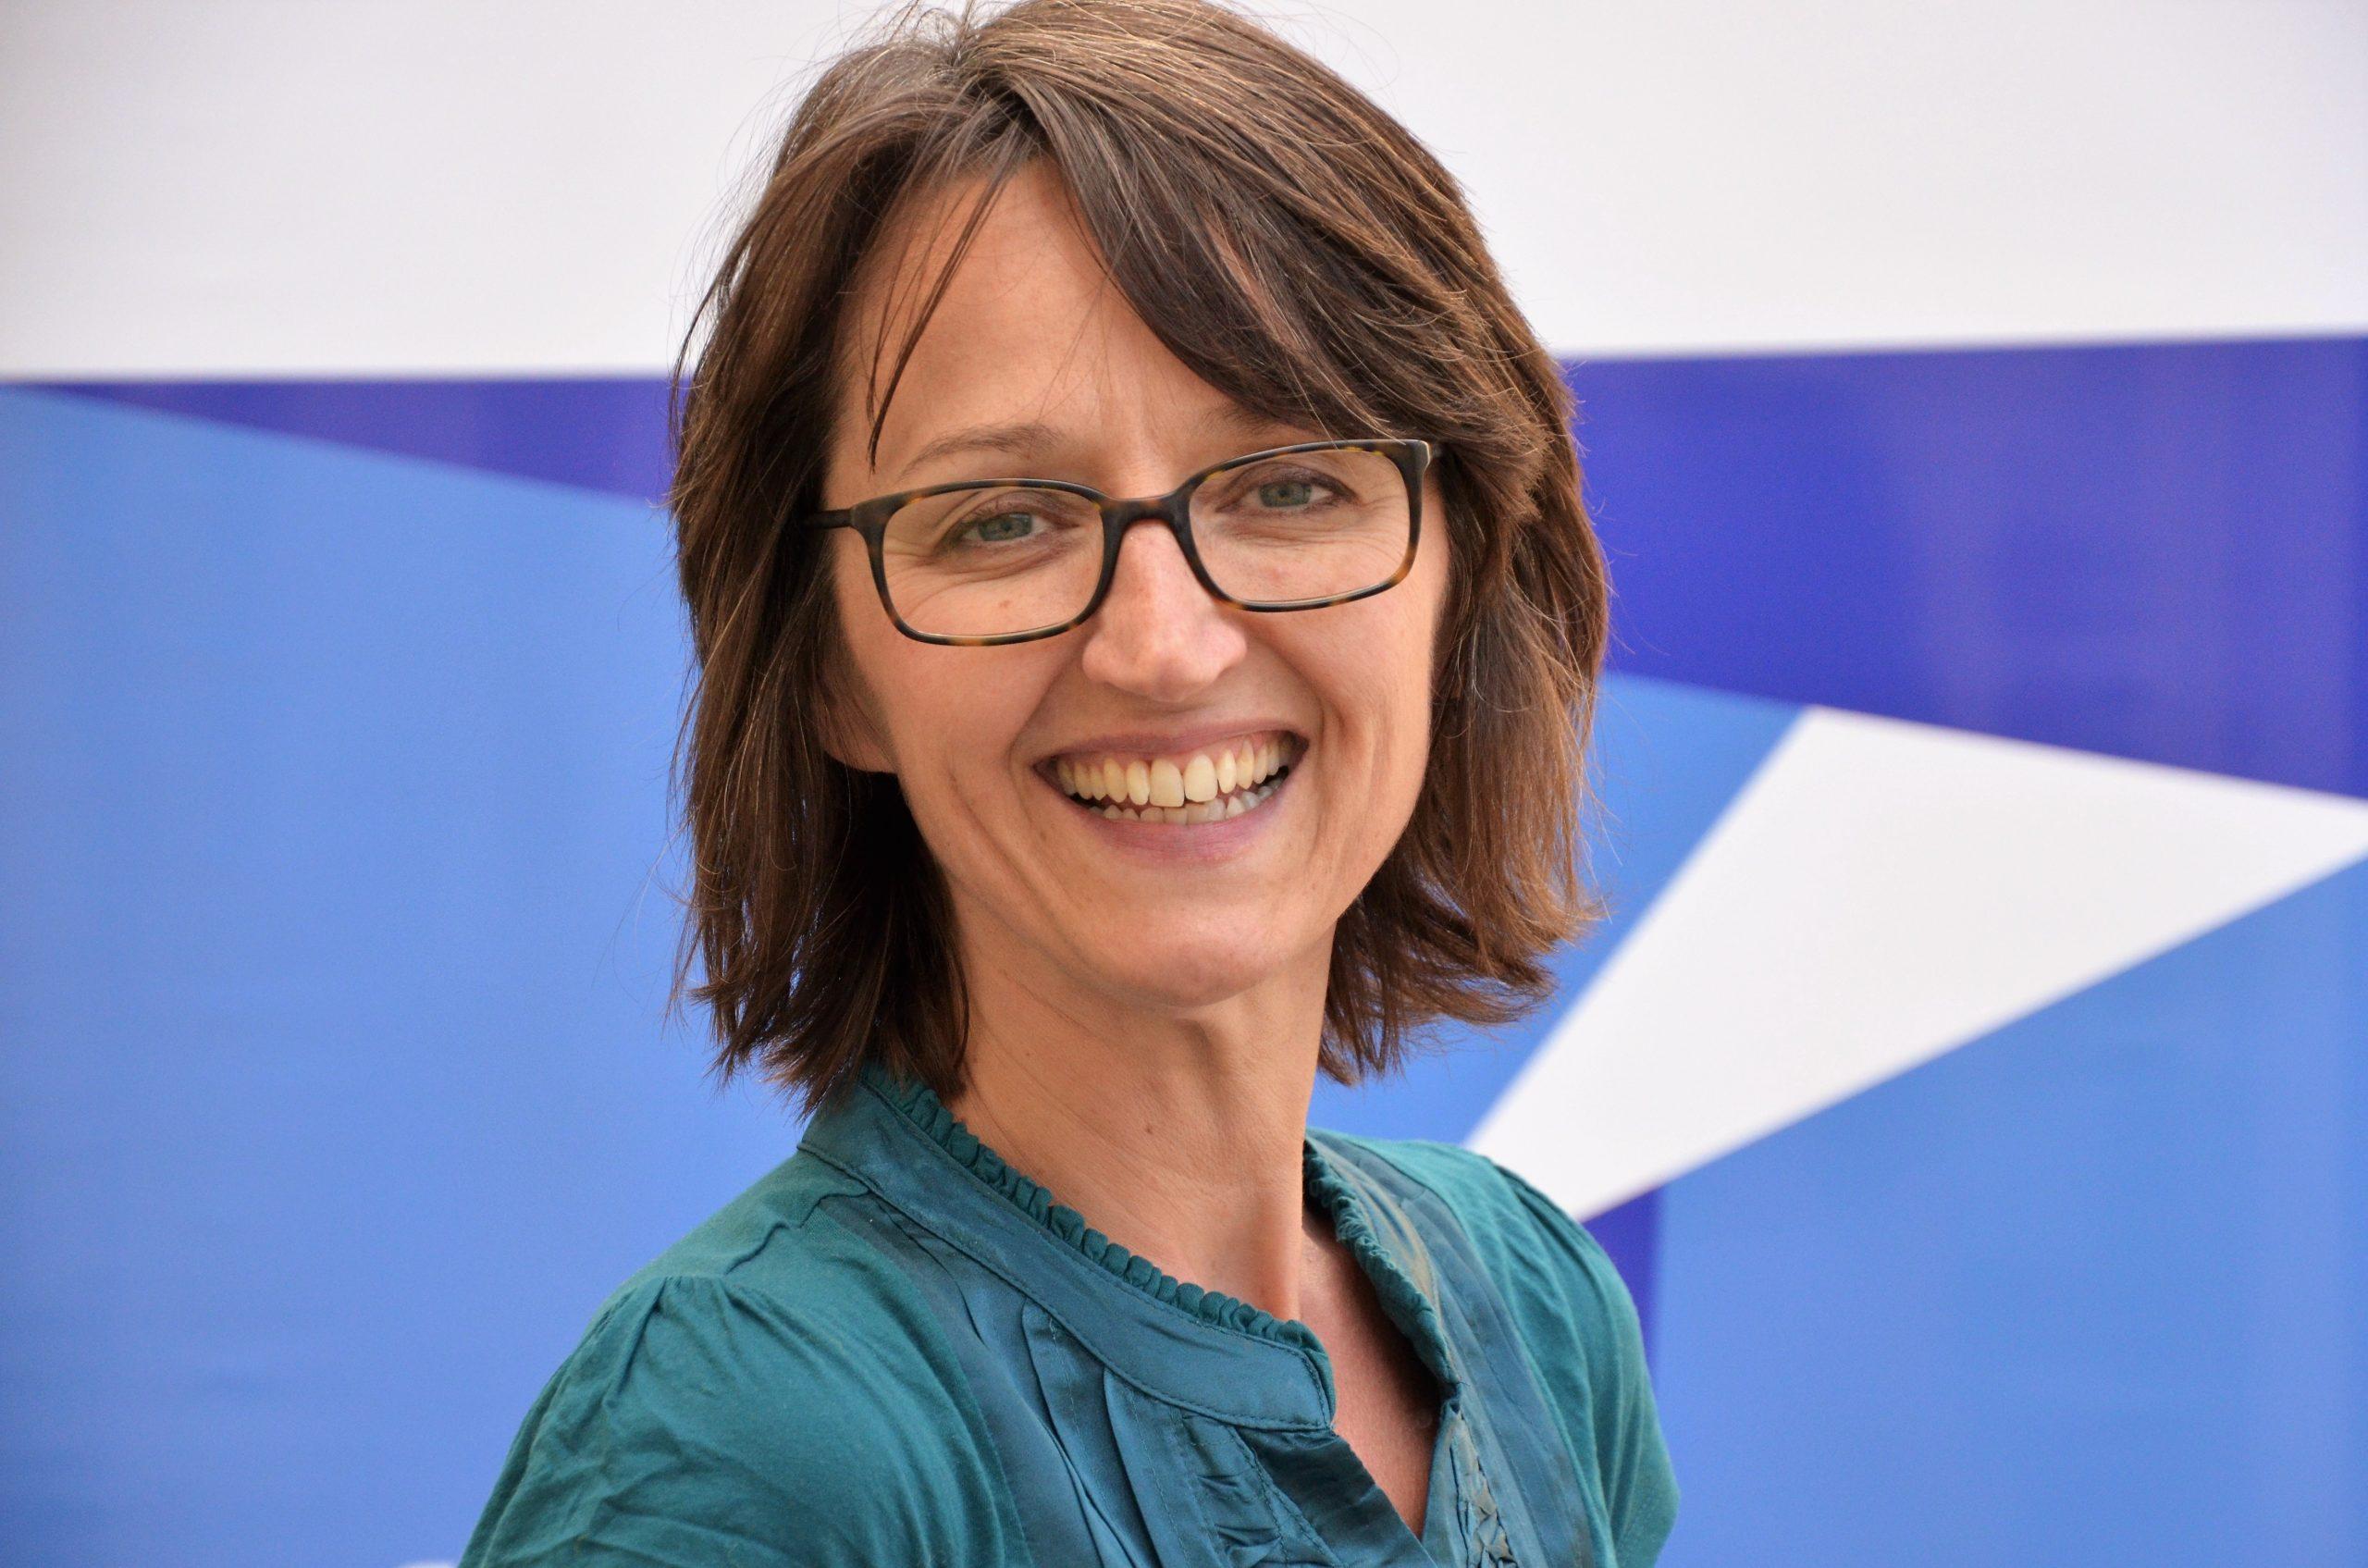 Liane Daiber